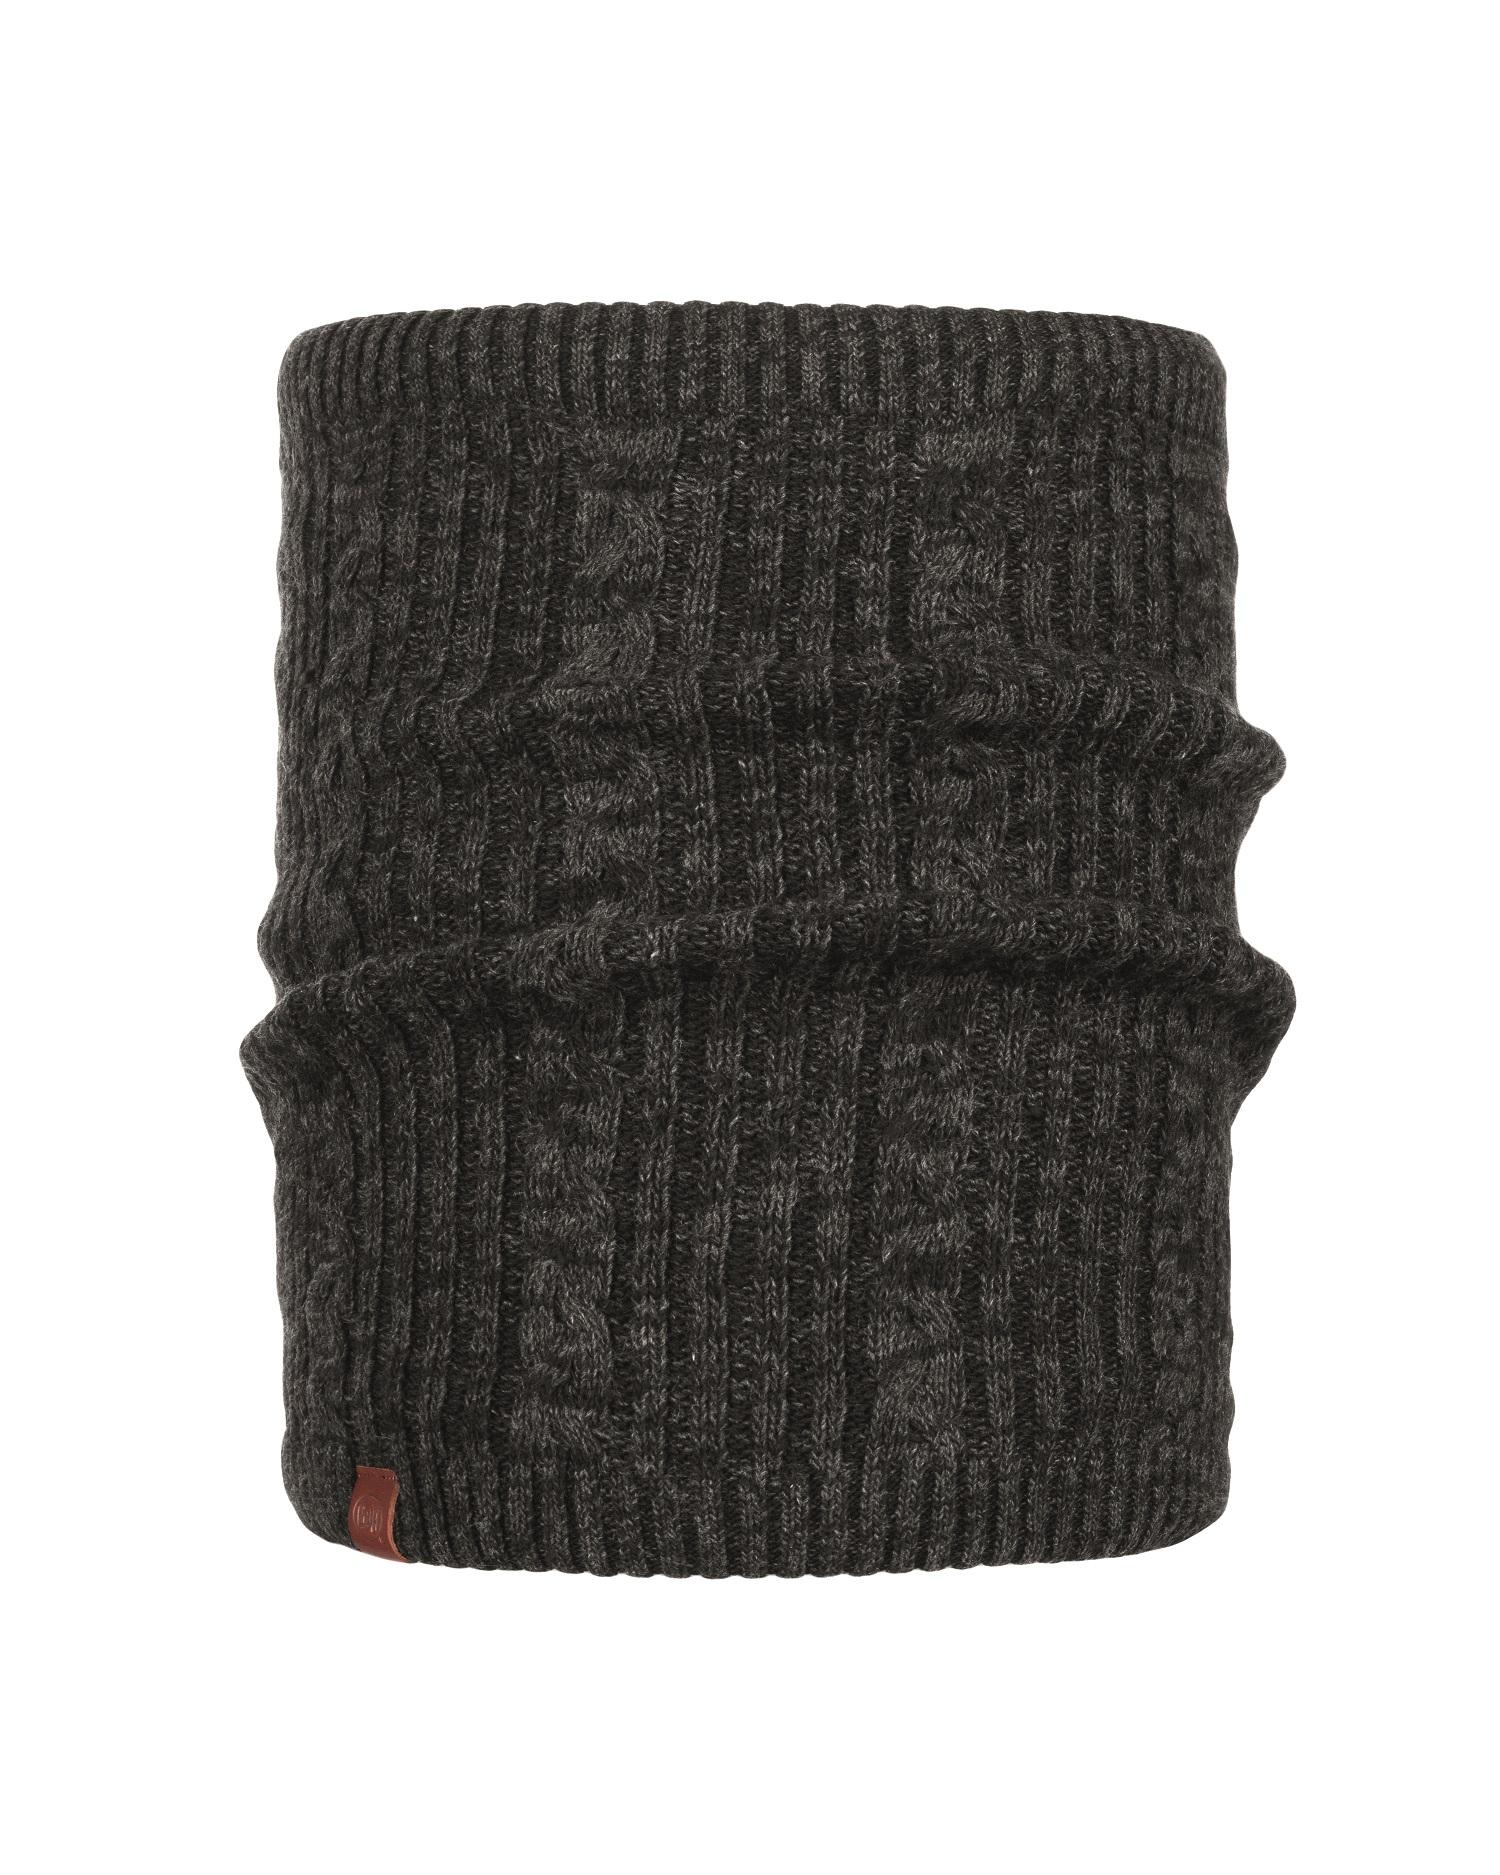 Купить Шарф BUFF KNITTED & POLAR NECKWARMER COMFORT BRAIDY BLACK Банданы и шарфы Buff ® 1377317